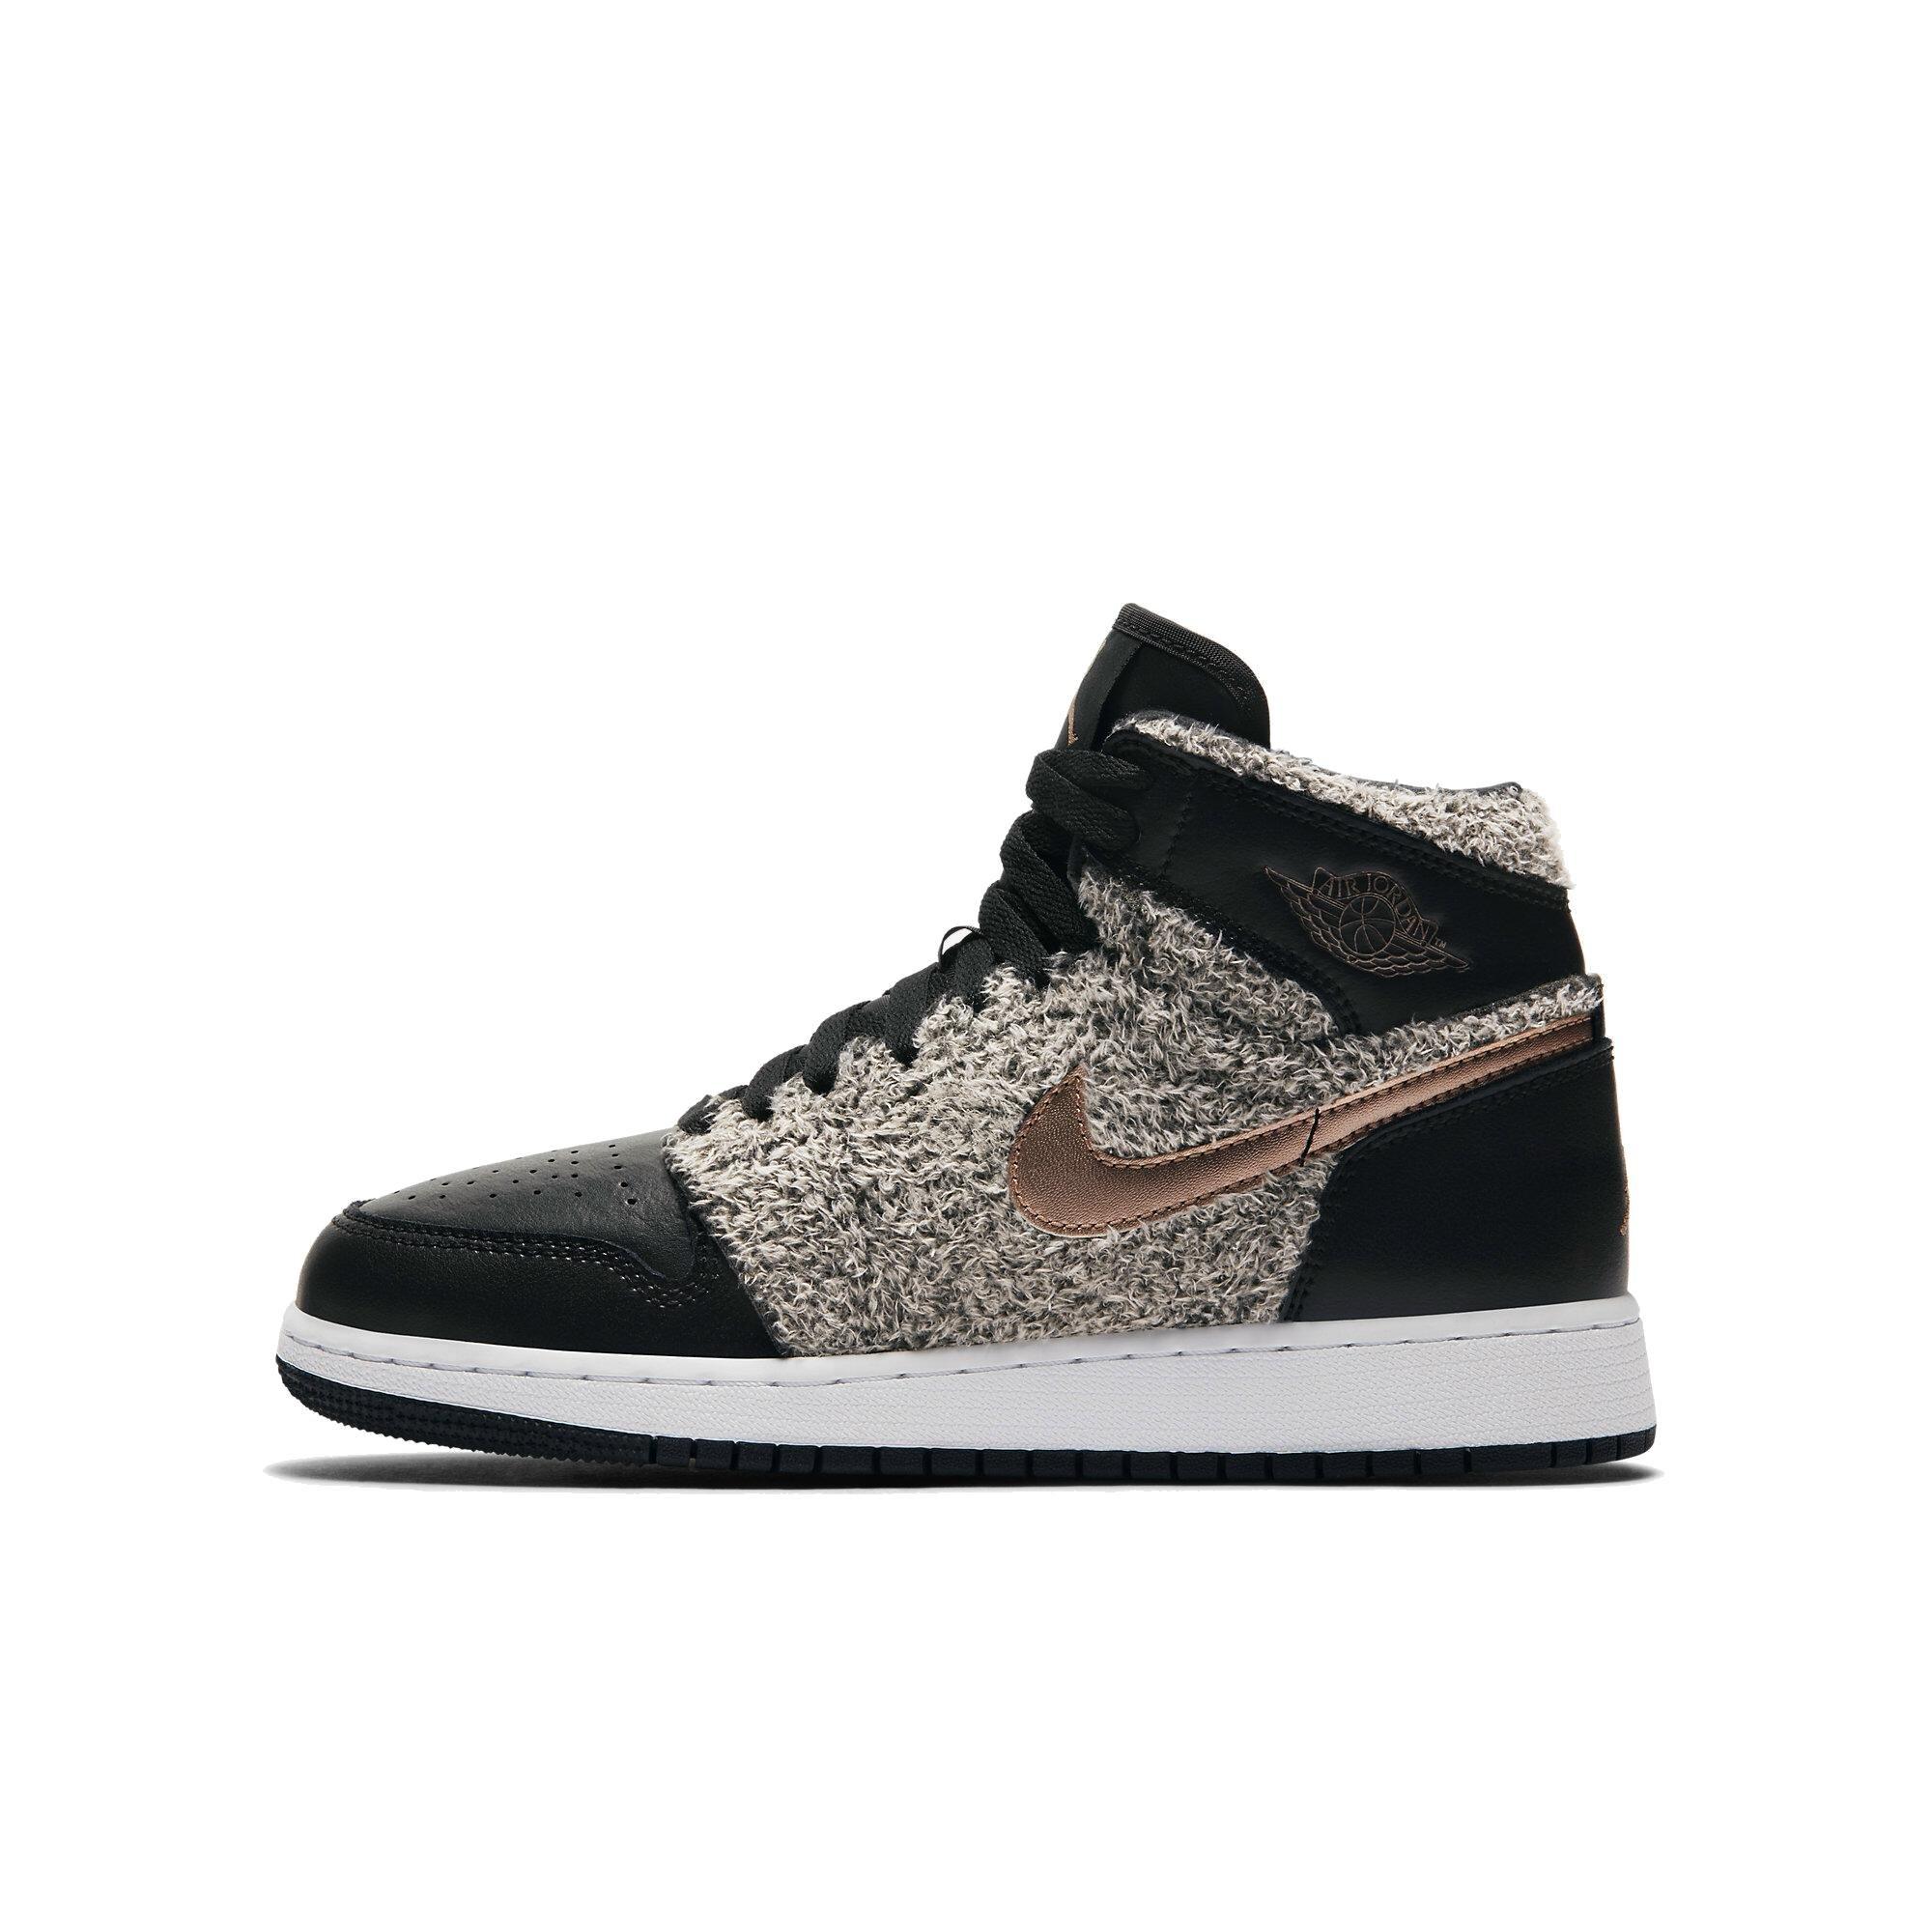 Jordan Air 1 Retro High GG Big kids Shoes Black/Metallic Bronze/White 332148-022 (4 M US)